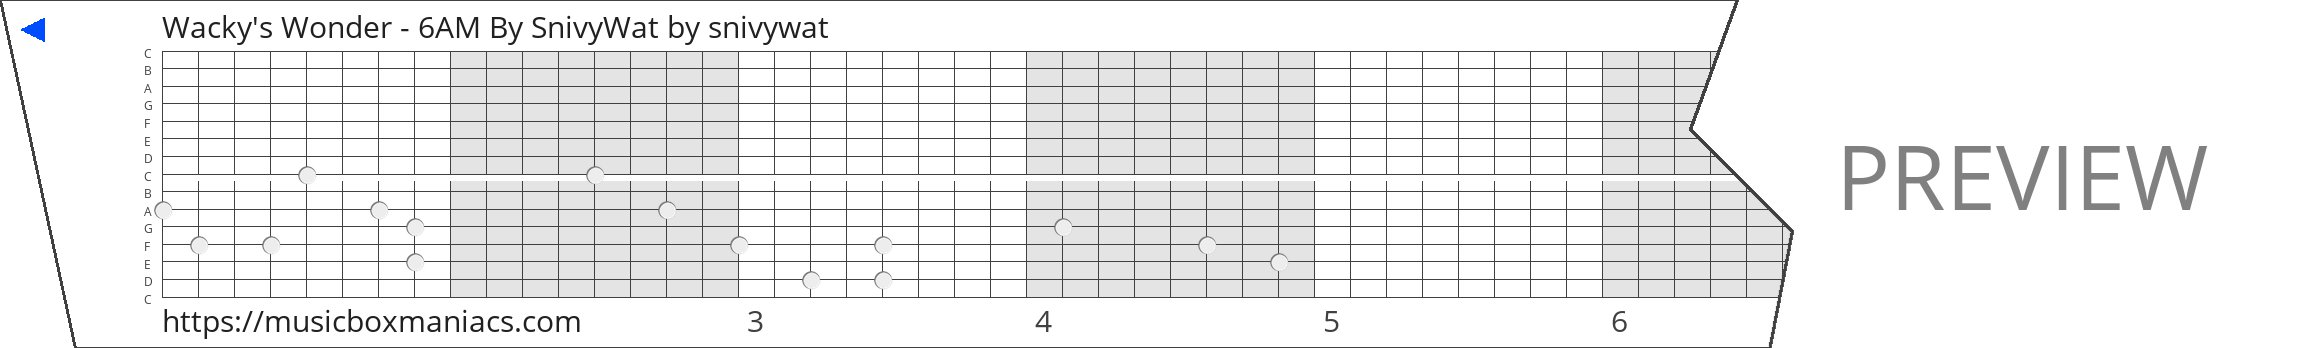 Wacky's Wonder - 6AM By SnivyWat 15 note music box paper strip